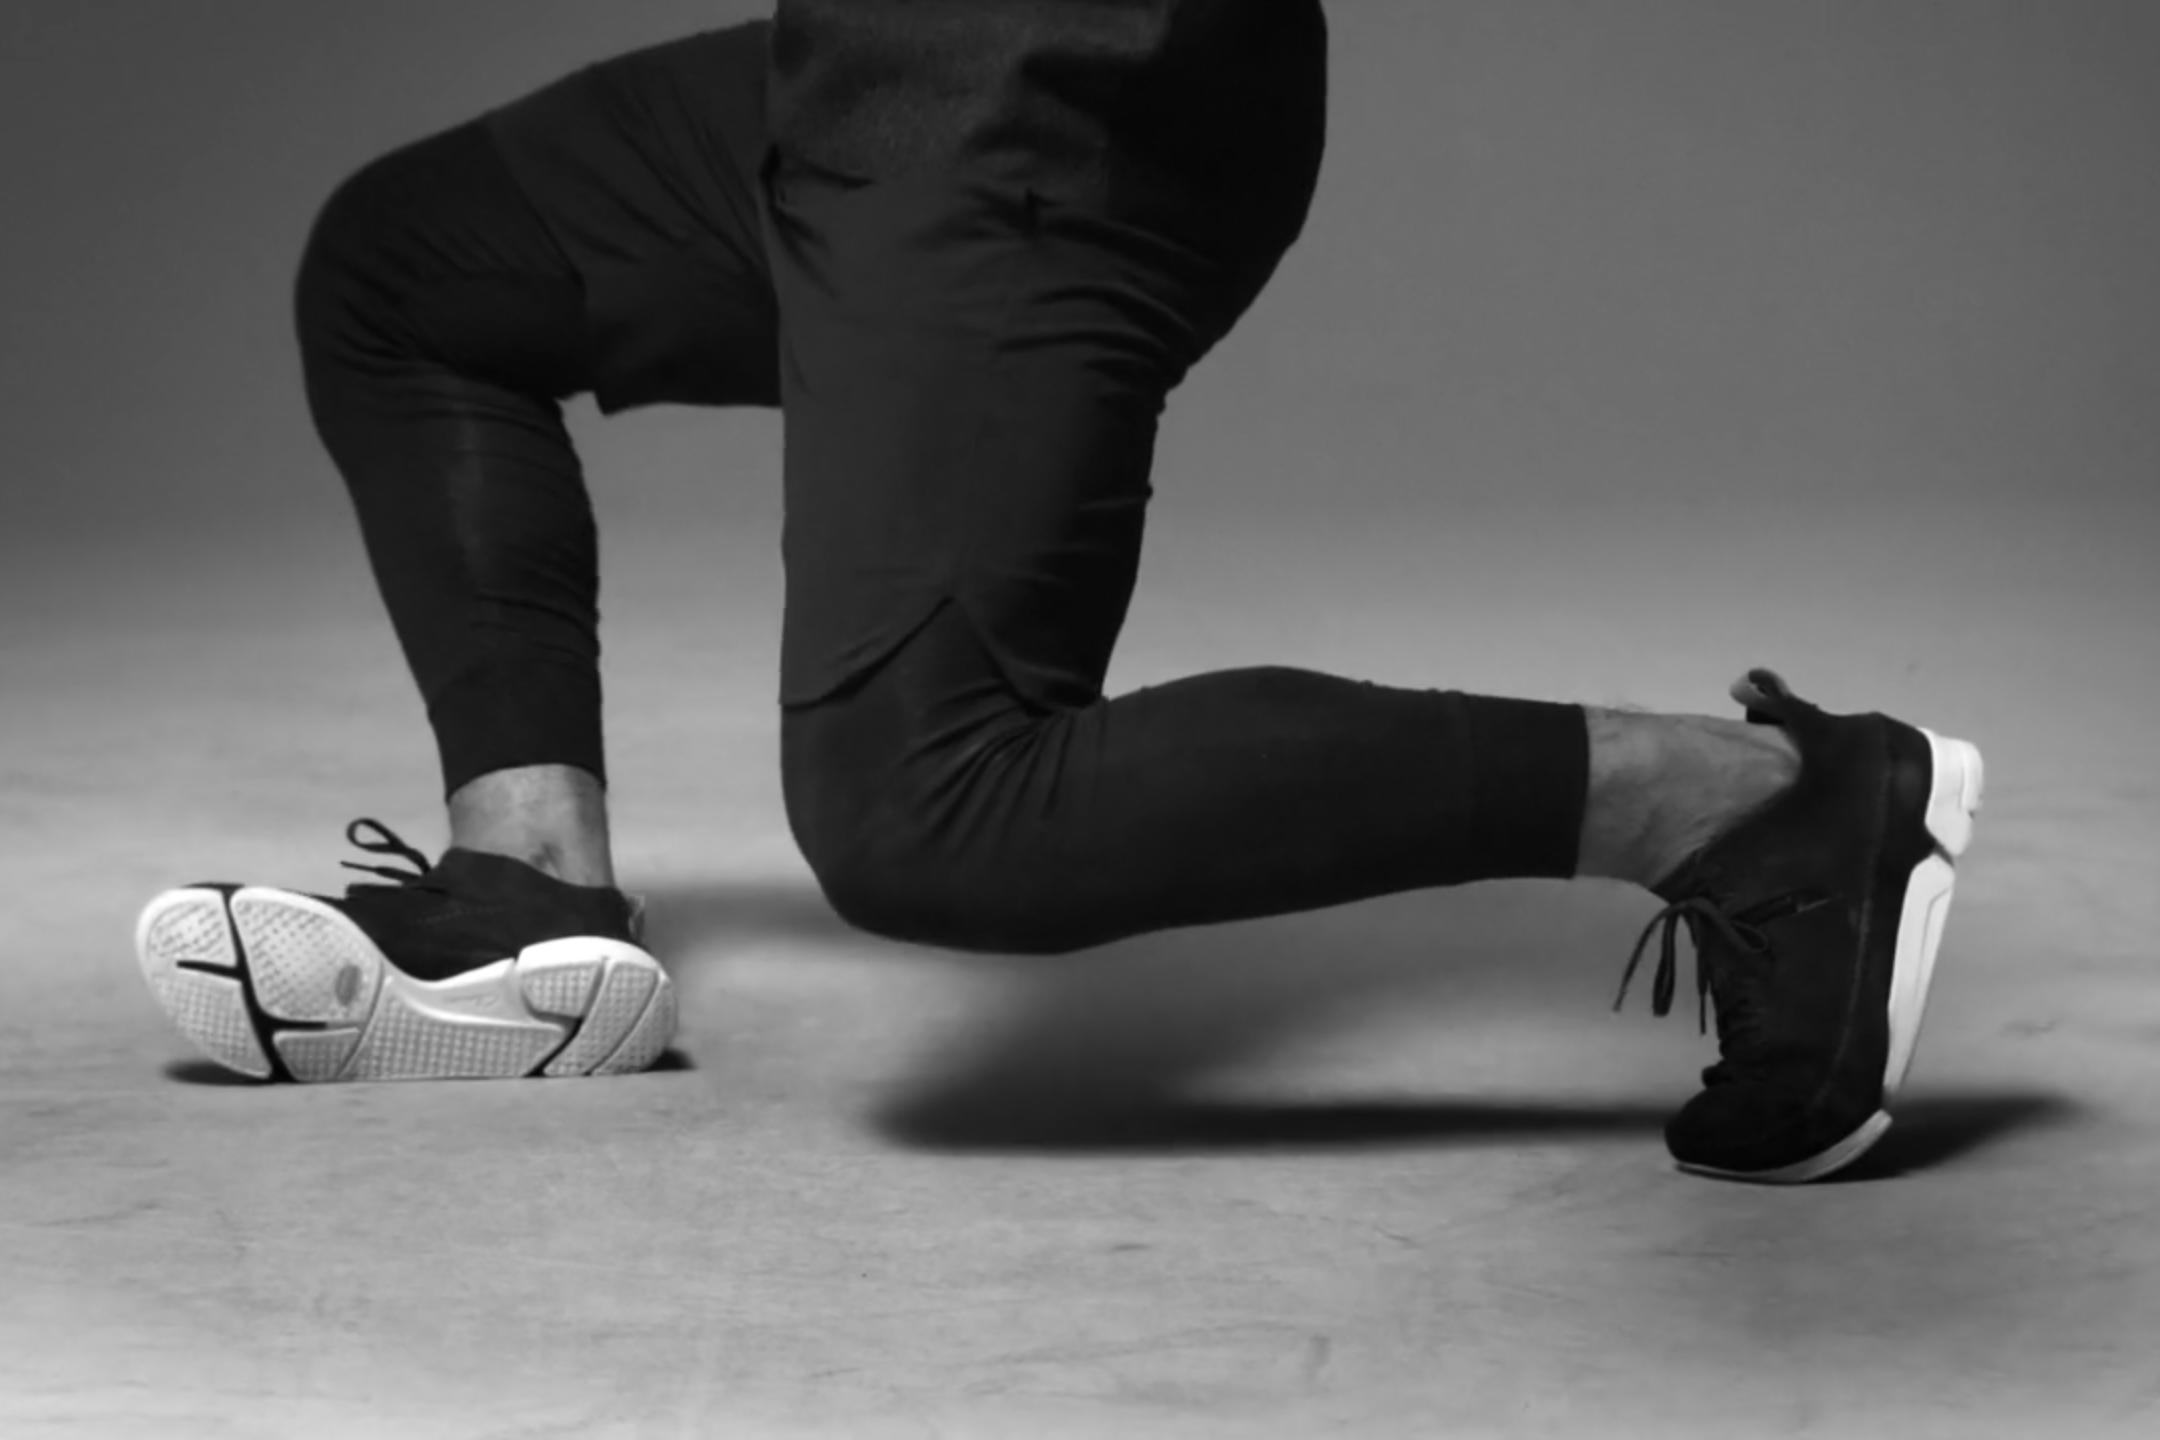 Expressive Dance in the Clarks Trigenic Flex